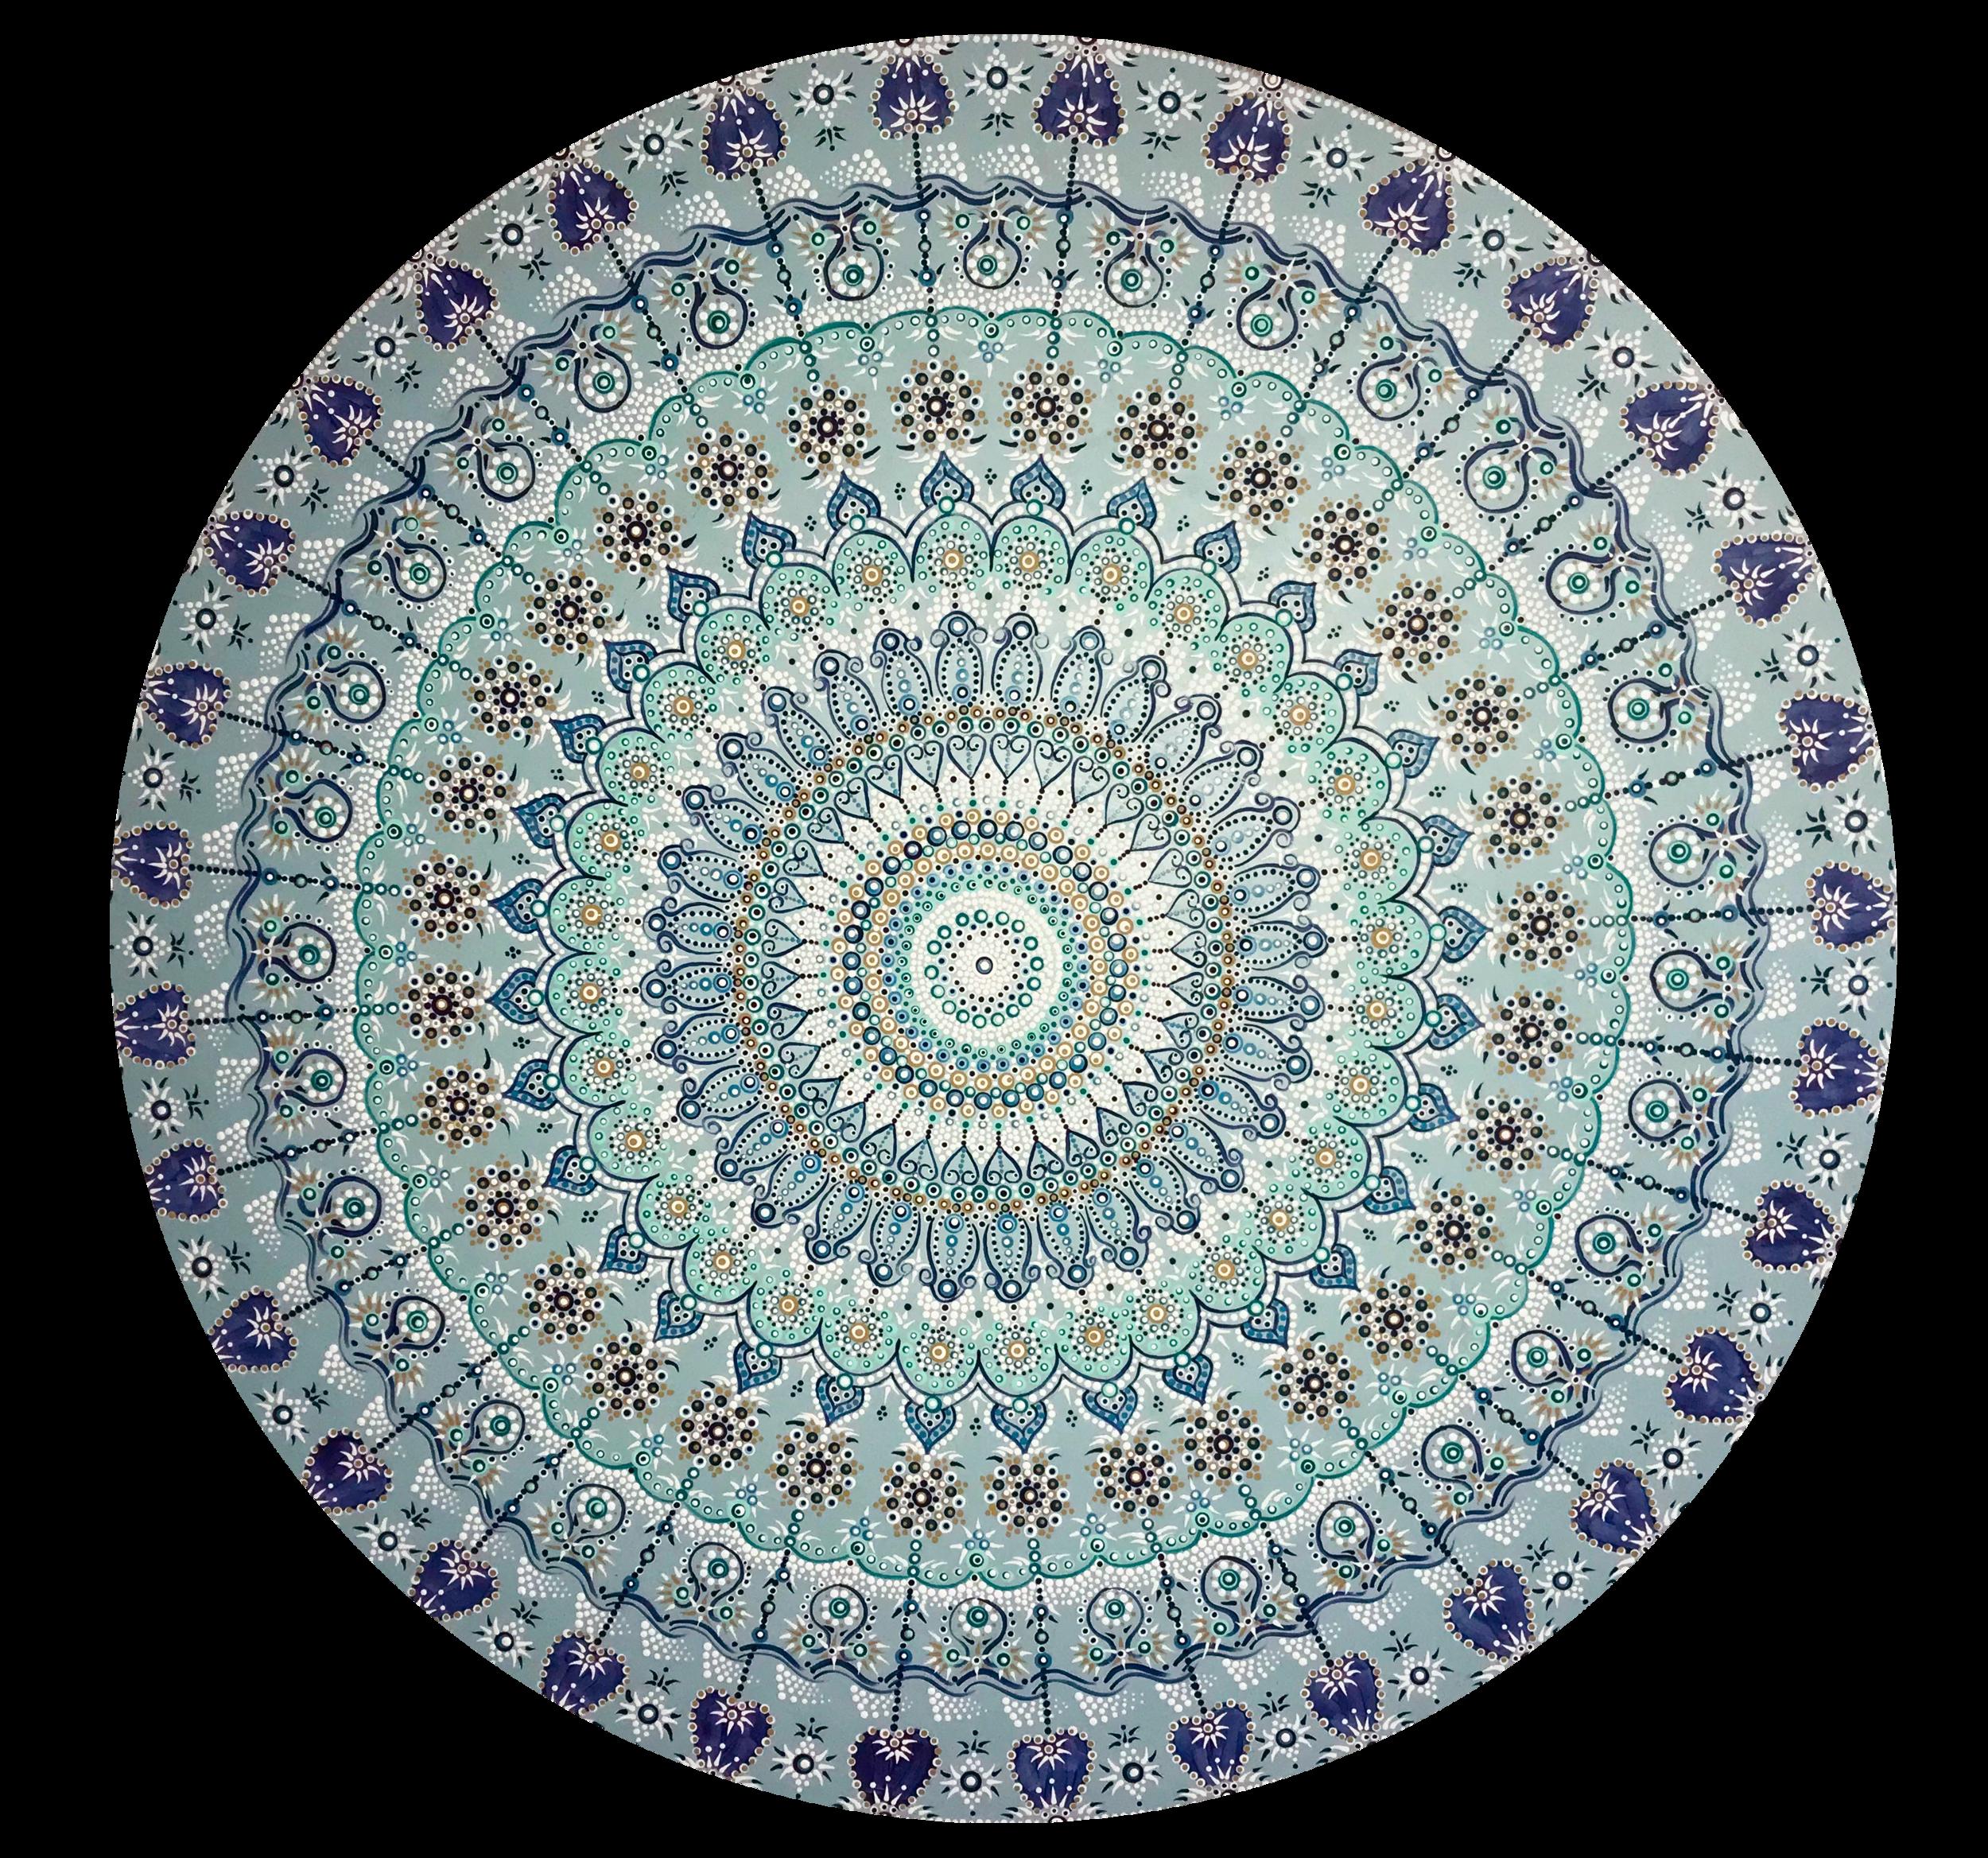 Mandala 2 - 201848 inch diameteracrylic on wood